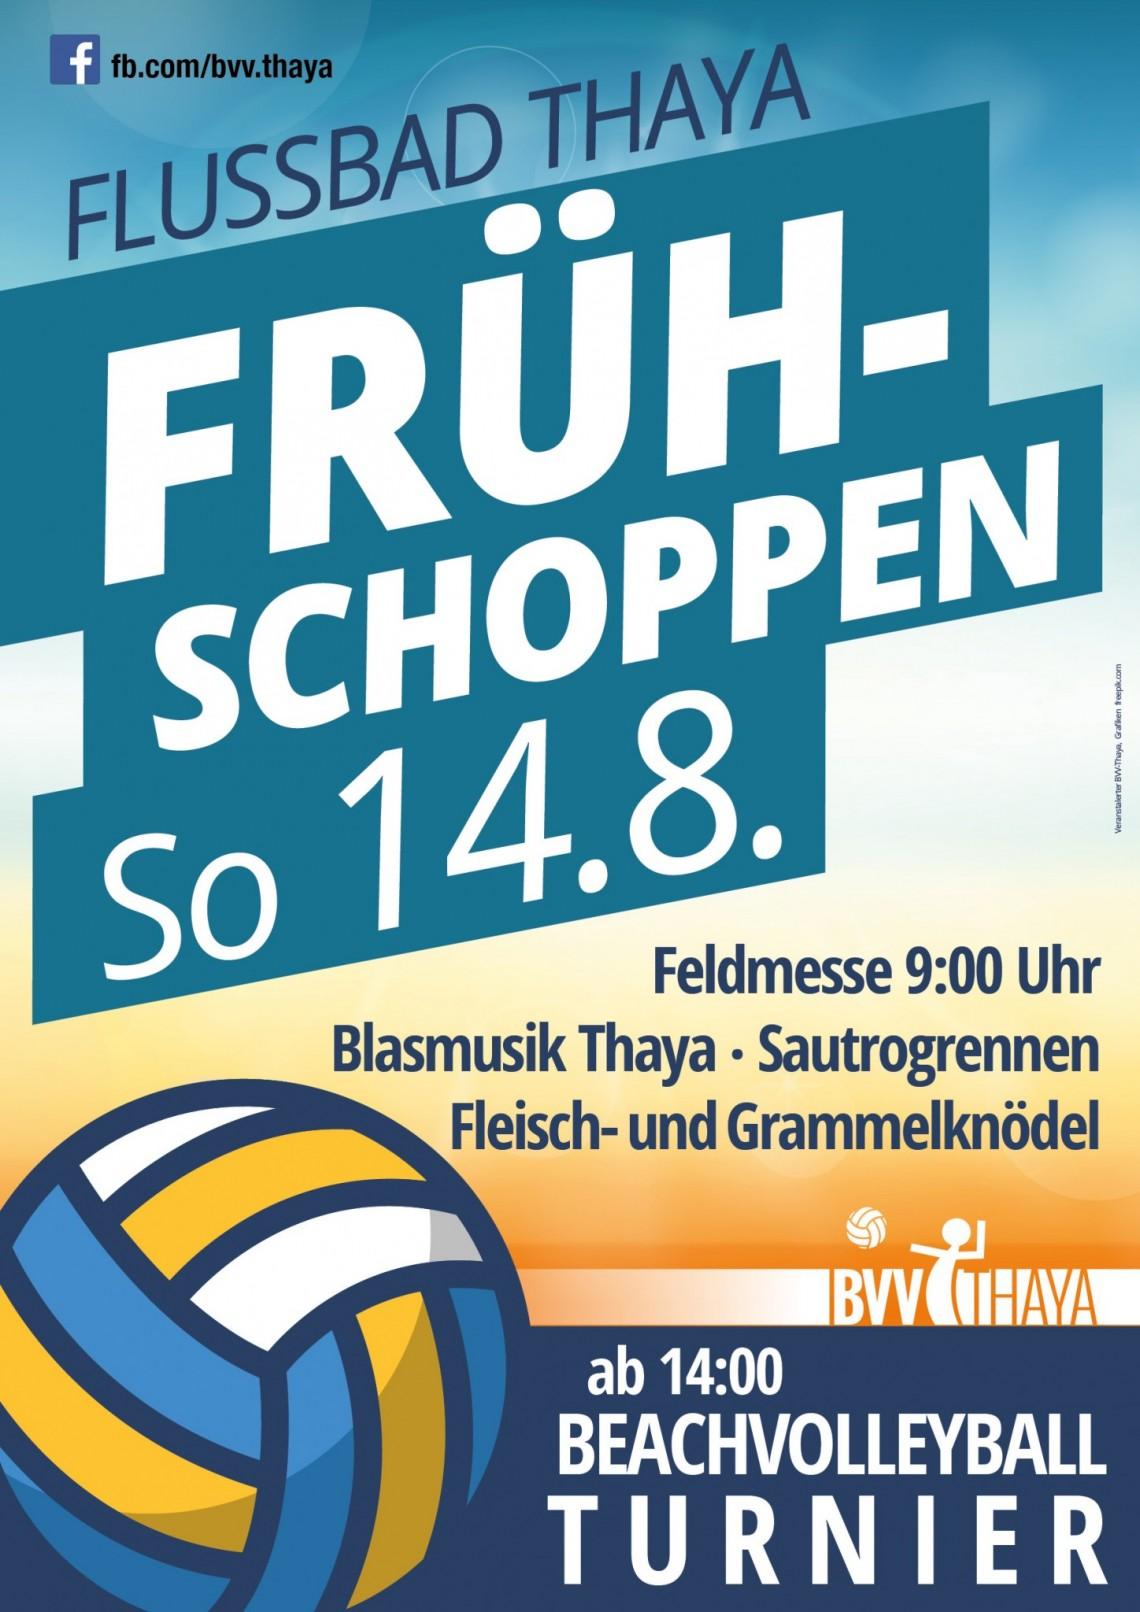 Fruehshoppen_2016c